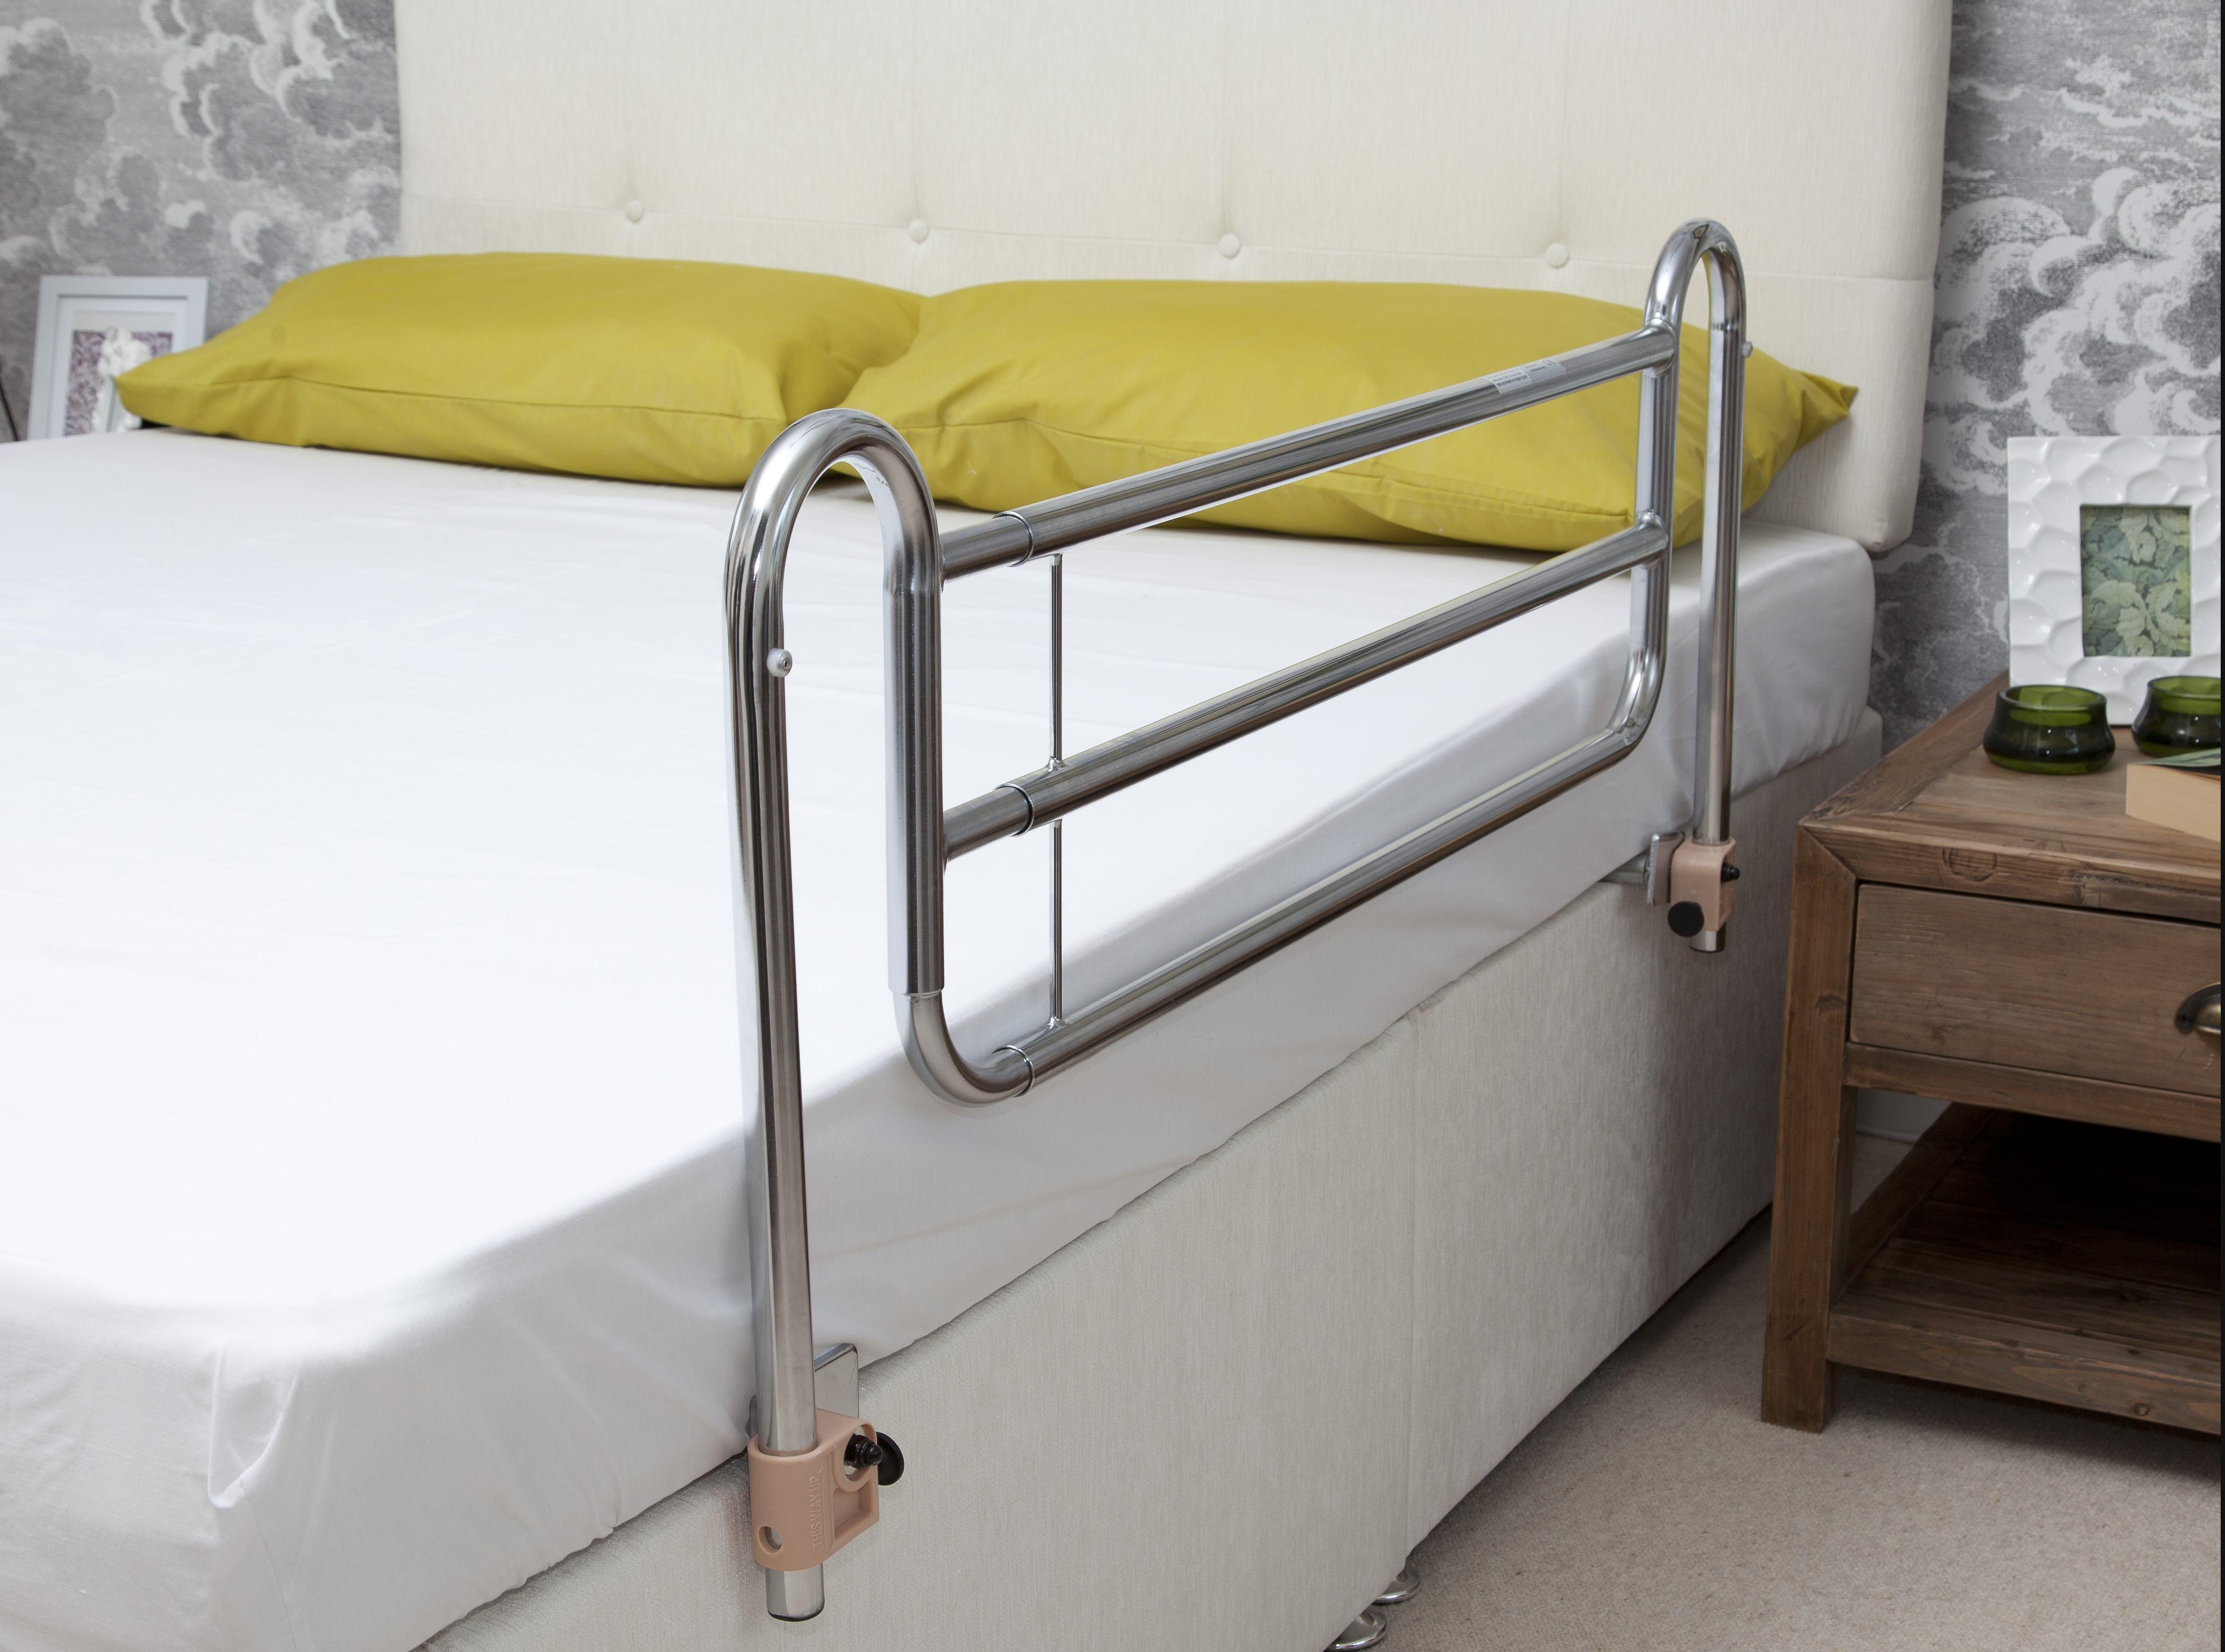 Bed rails for a divan bed